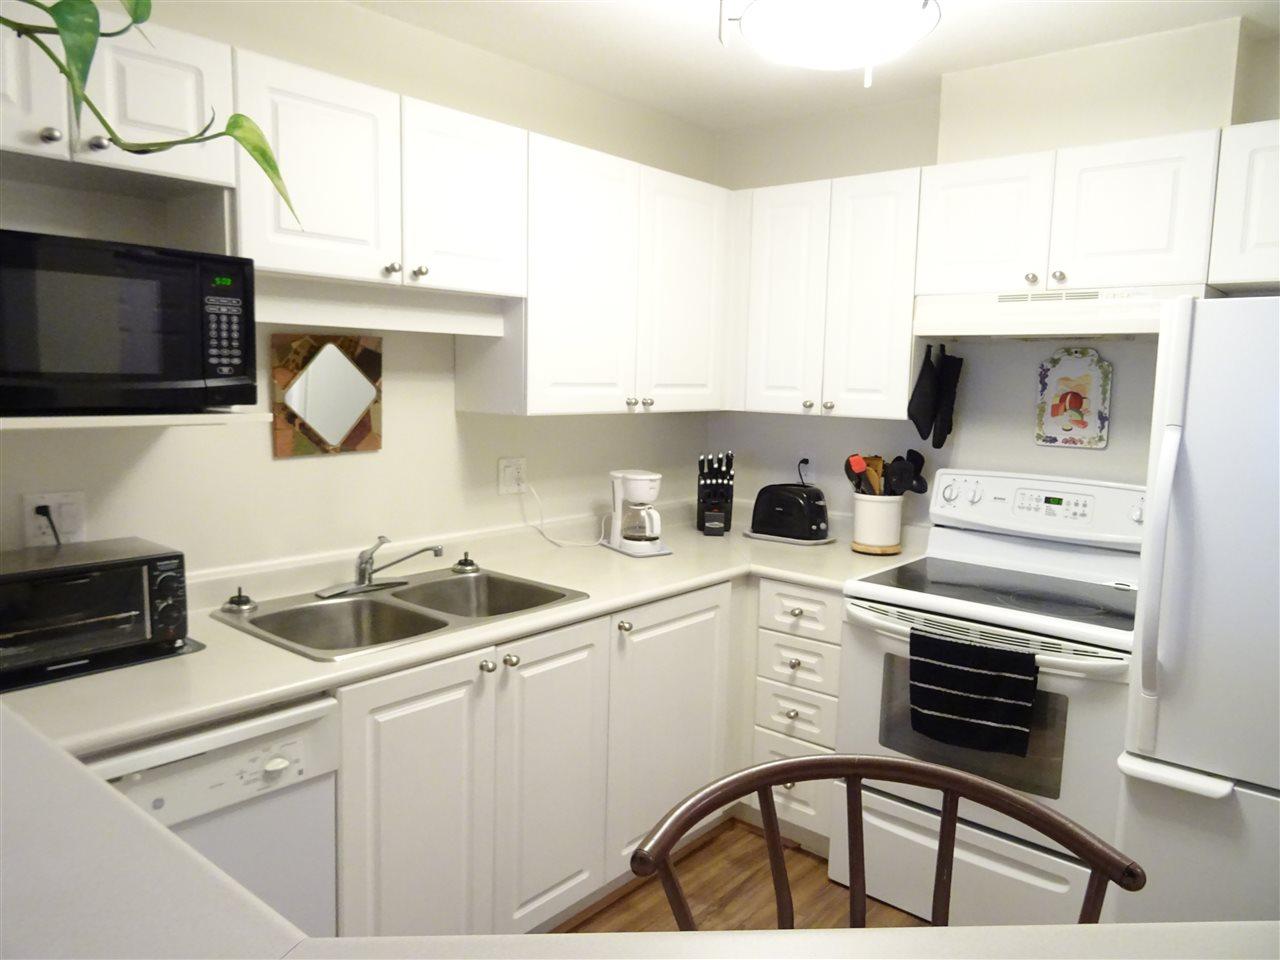 Condo Apartment at 402 5765 GLOVER ROAD, Unit 402, Langley, British Columbia. Image 2